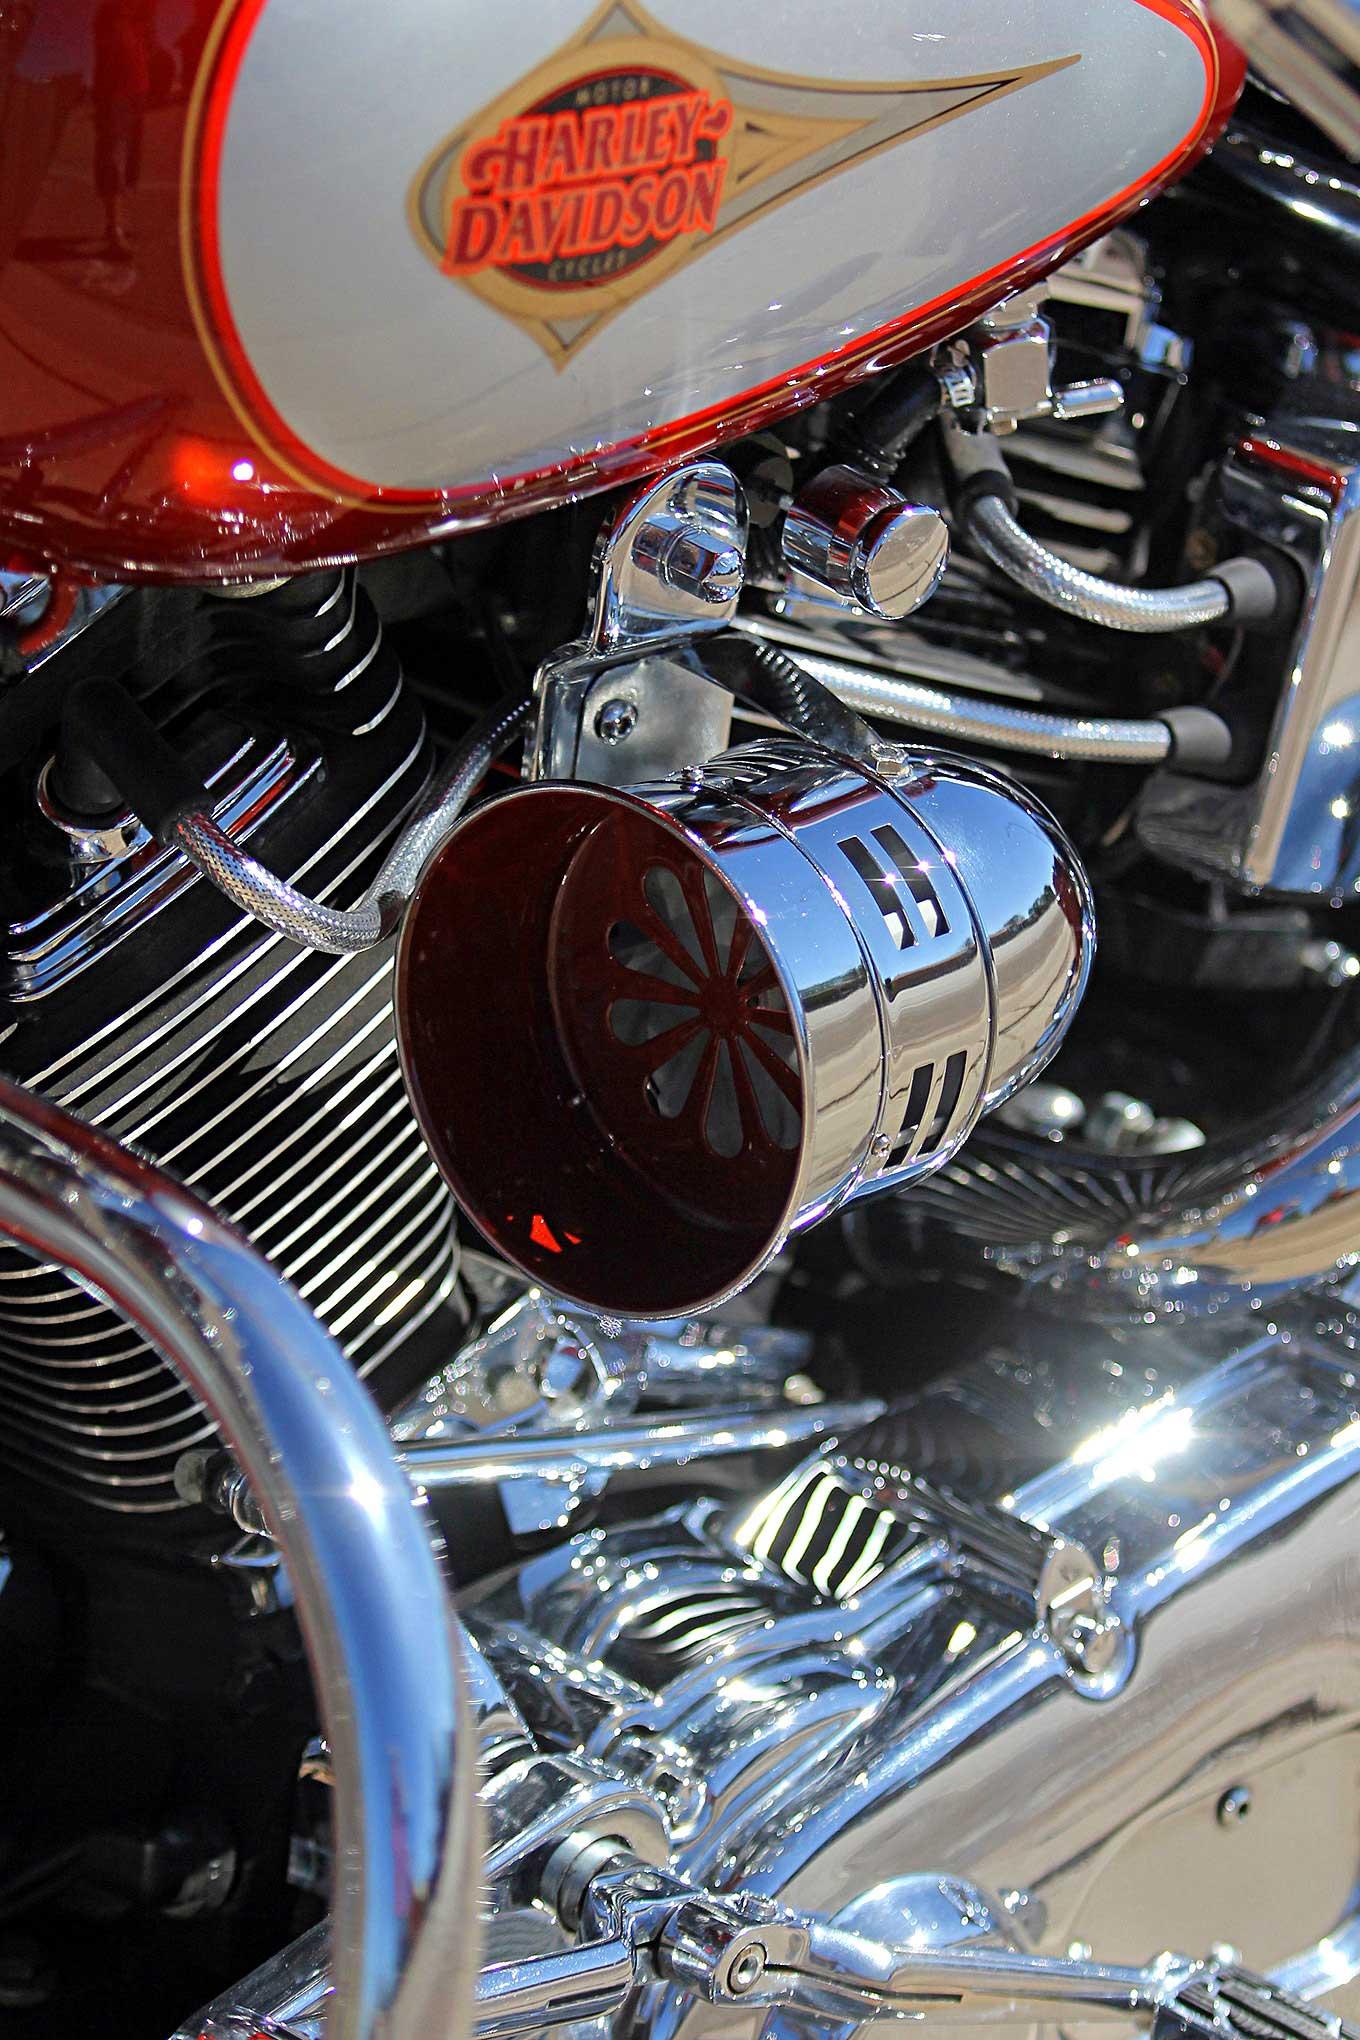 1999 Harley Davidson Heritage Softail Ride Of Passage